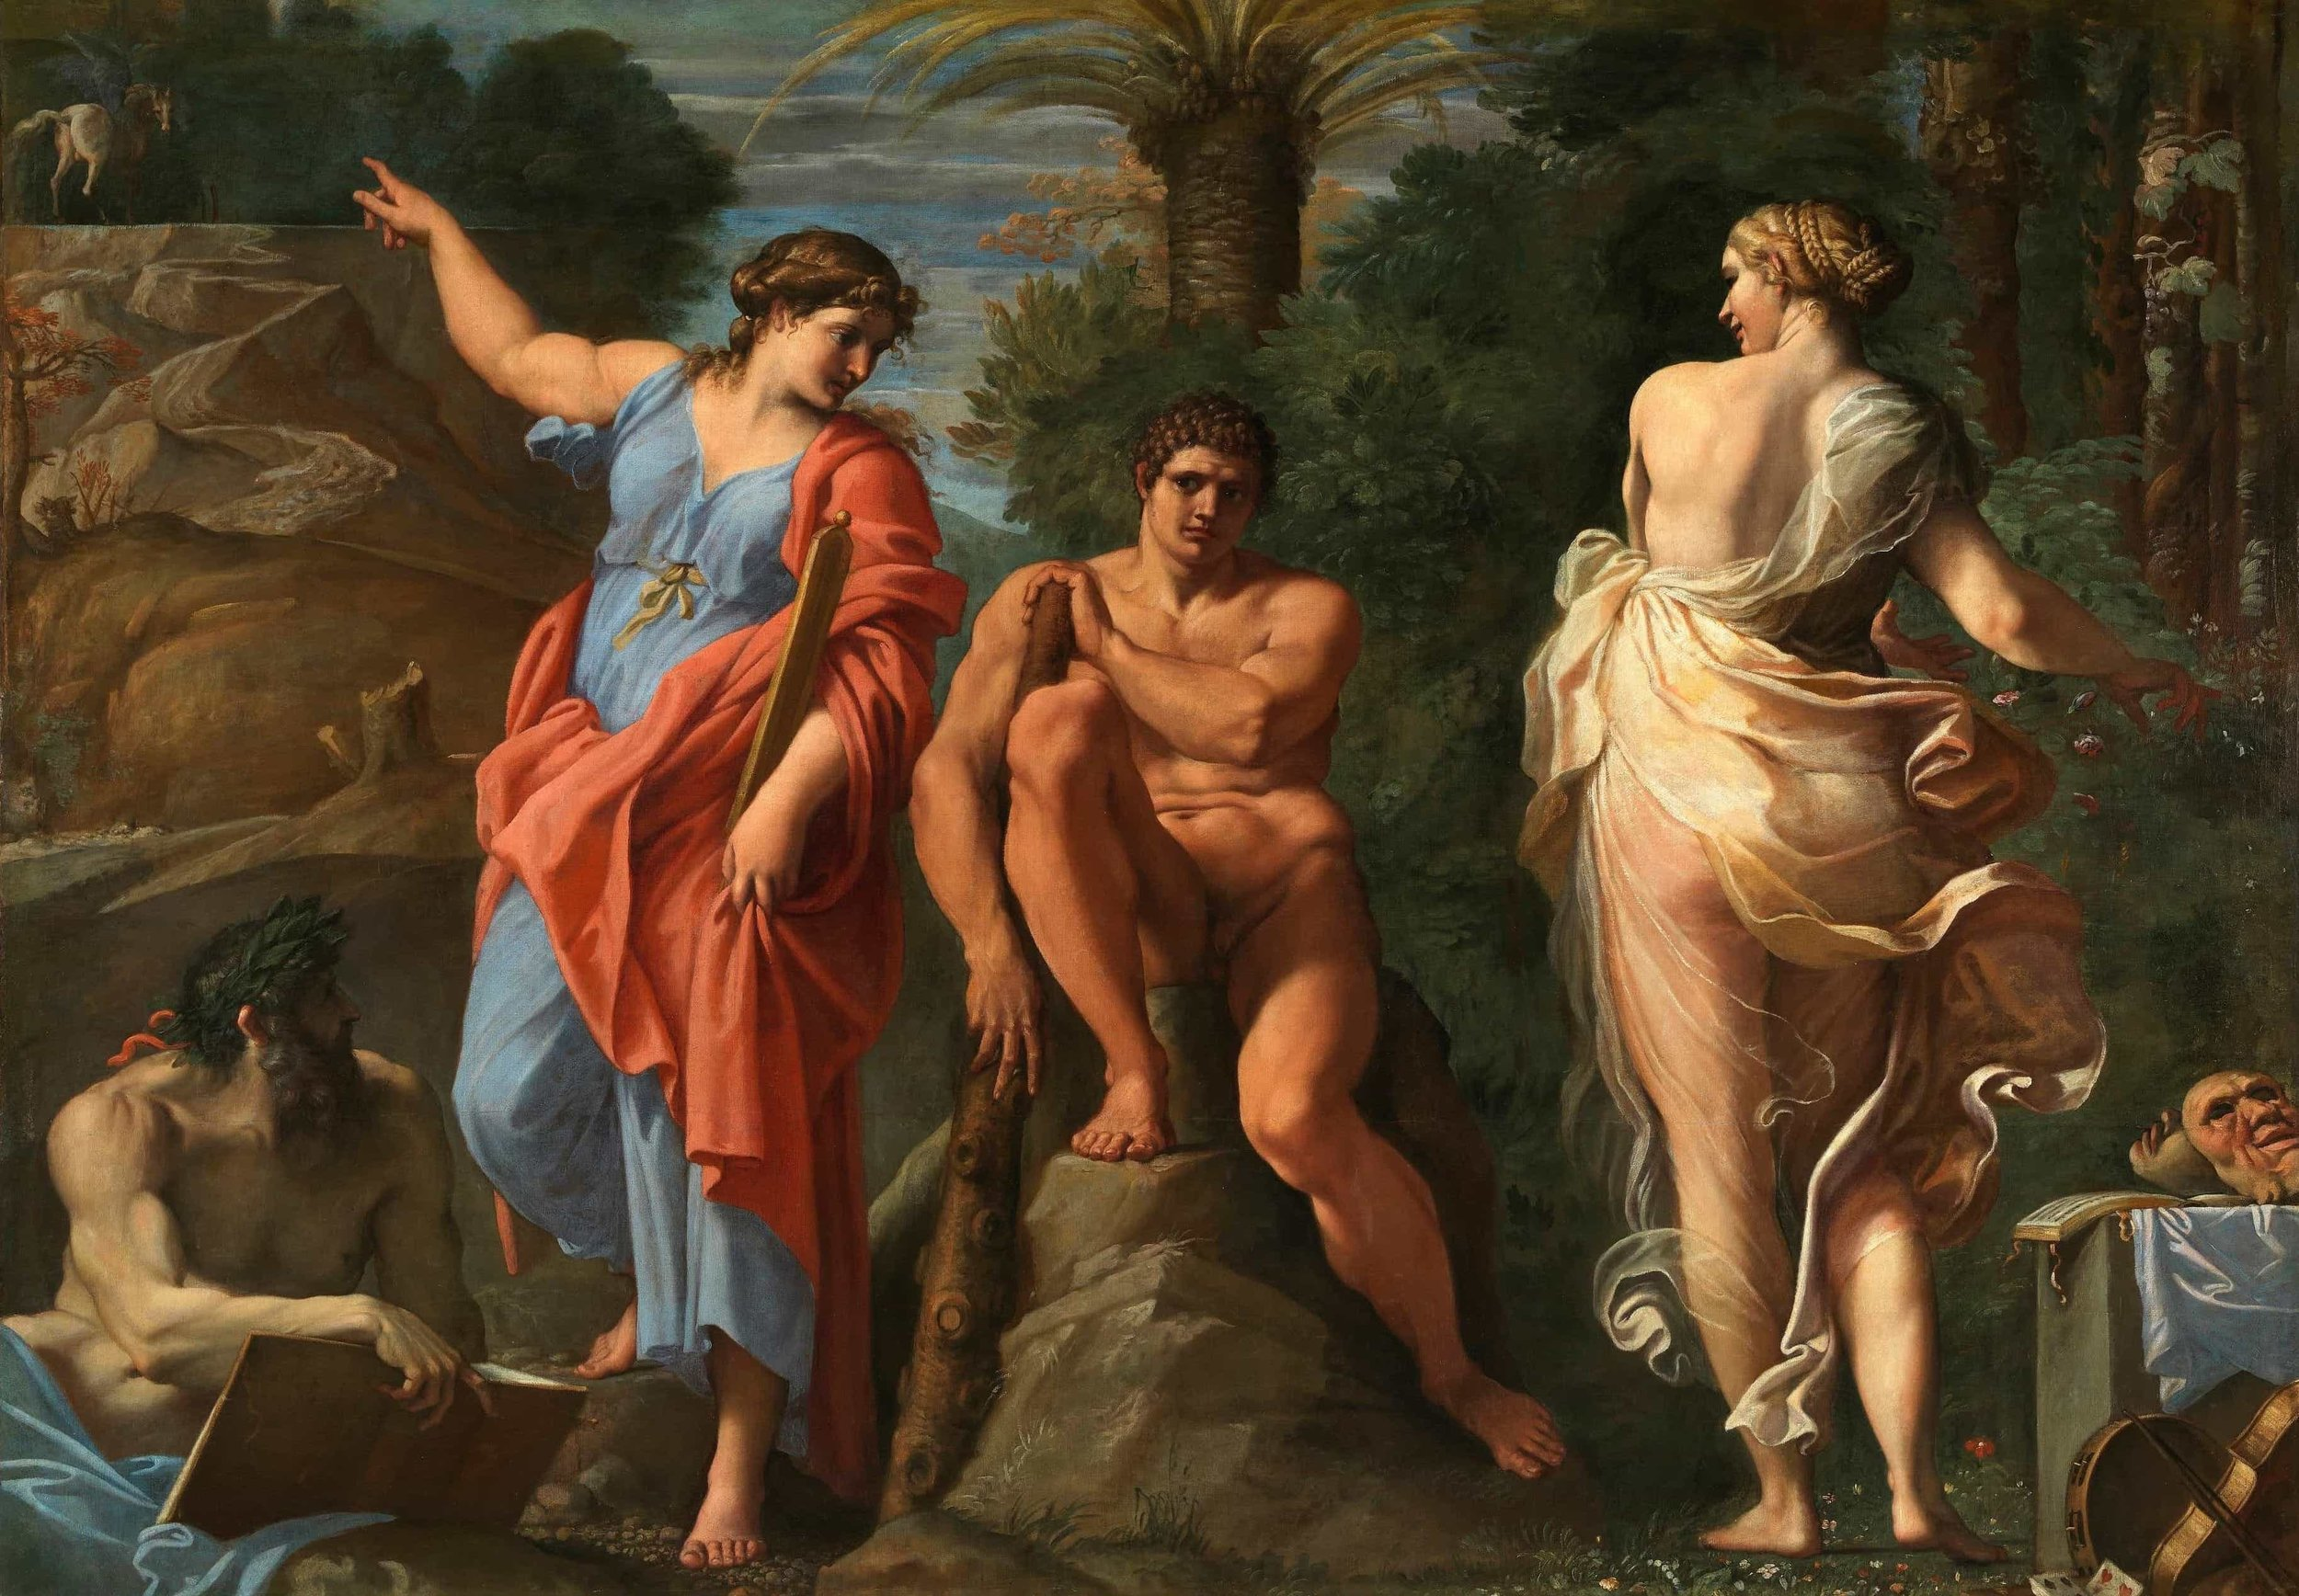 Annibale Carracci, Hercules at the Crossroads (1596)